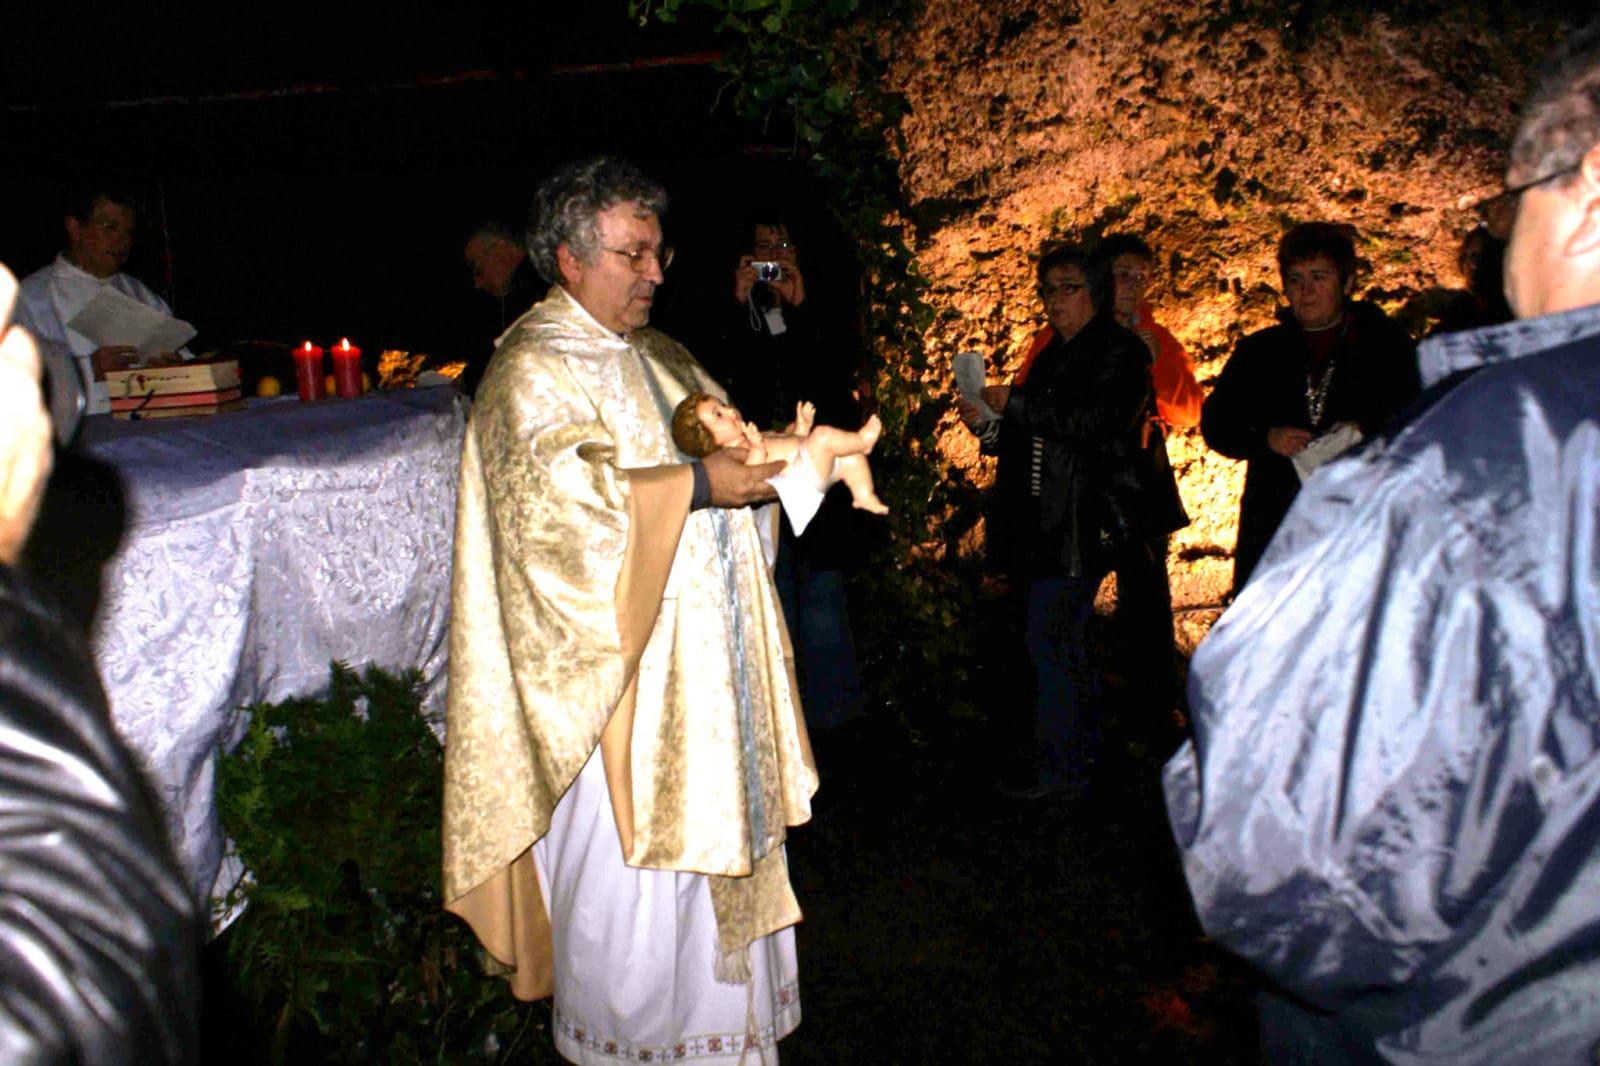 Рождественская Месса (фото: José Luís Ávila Silveira/Pedro Noronha e Costa)